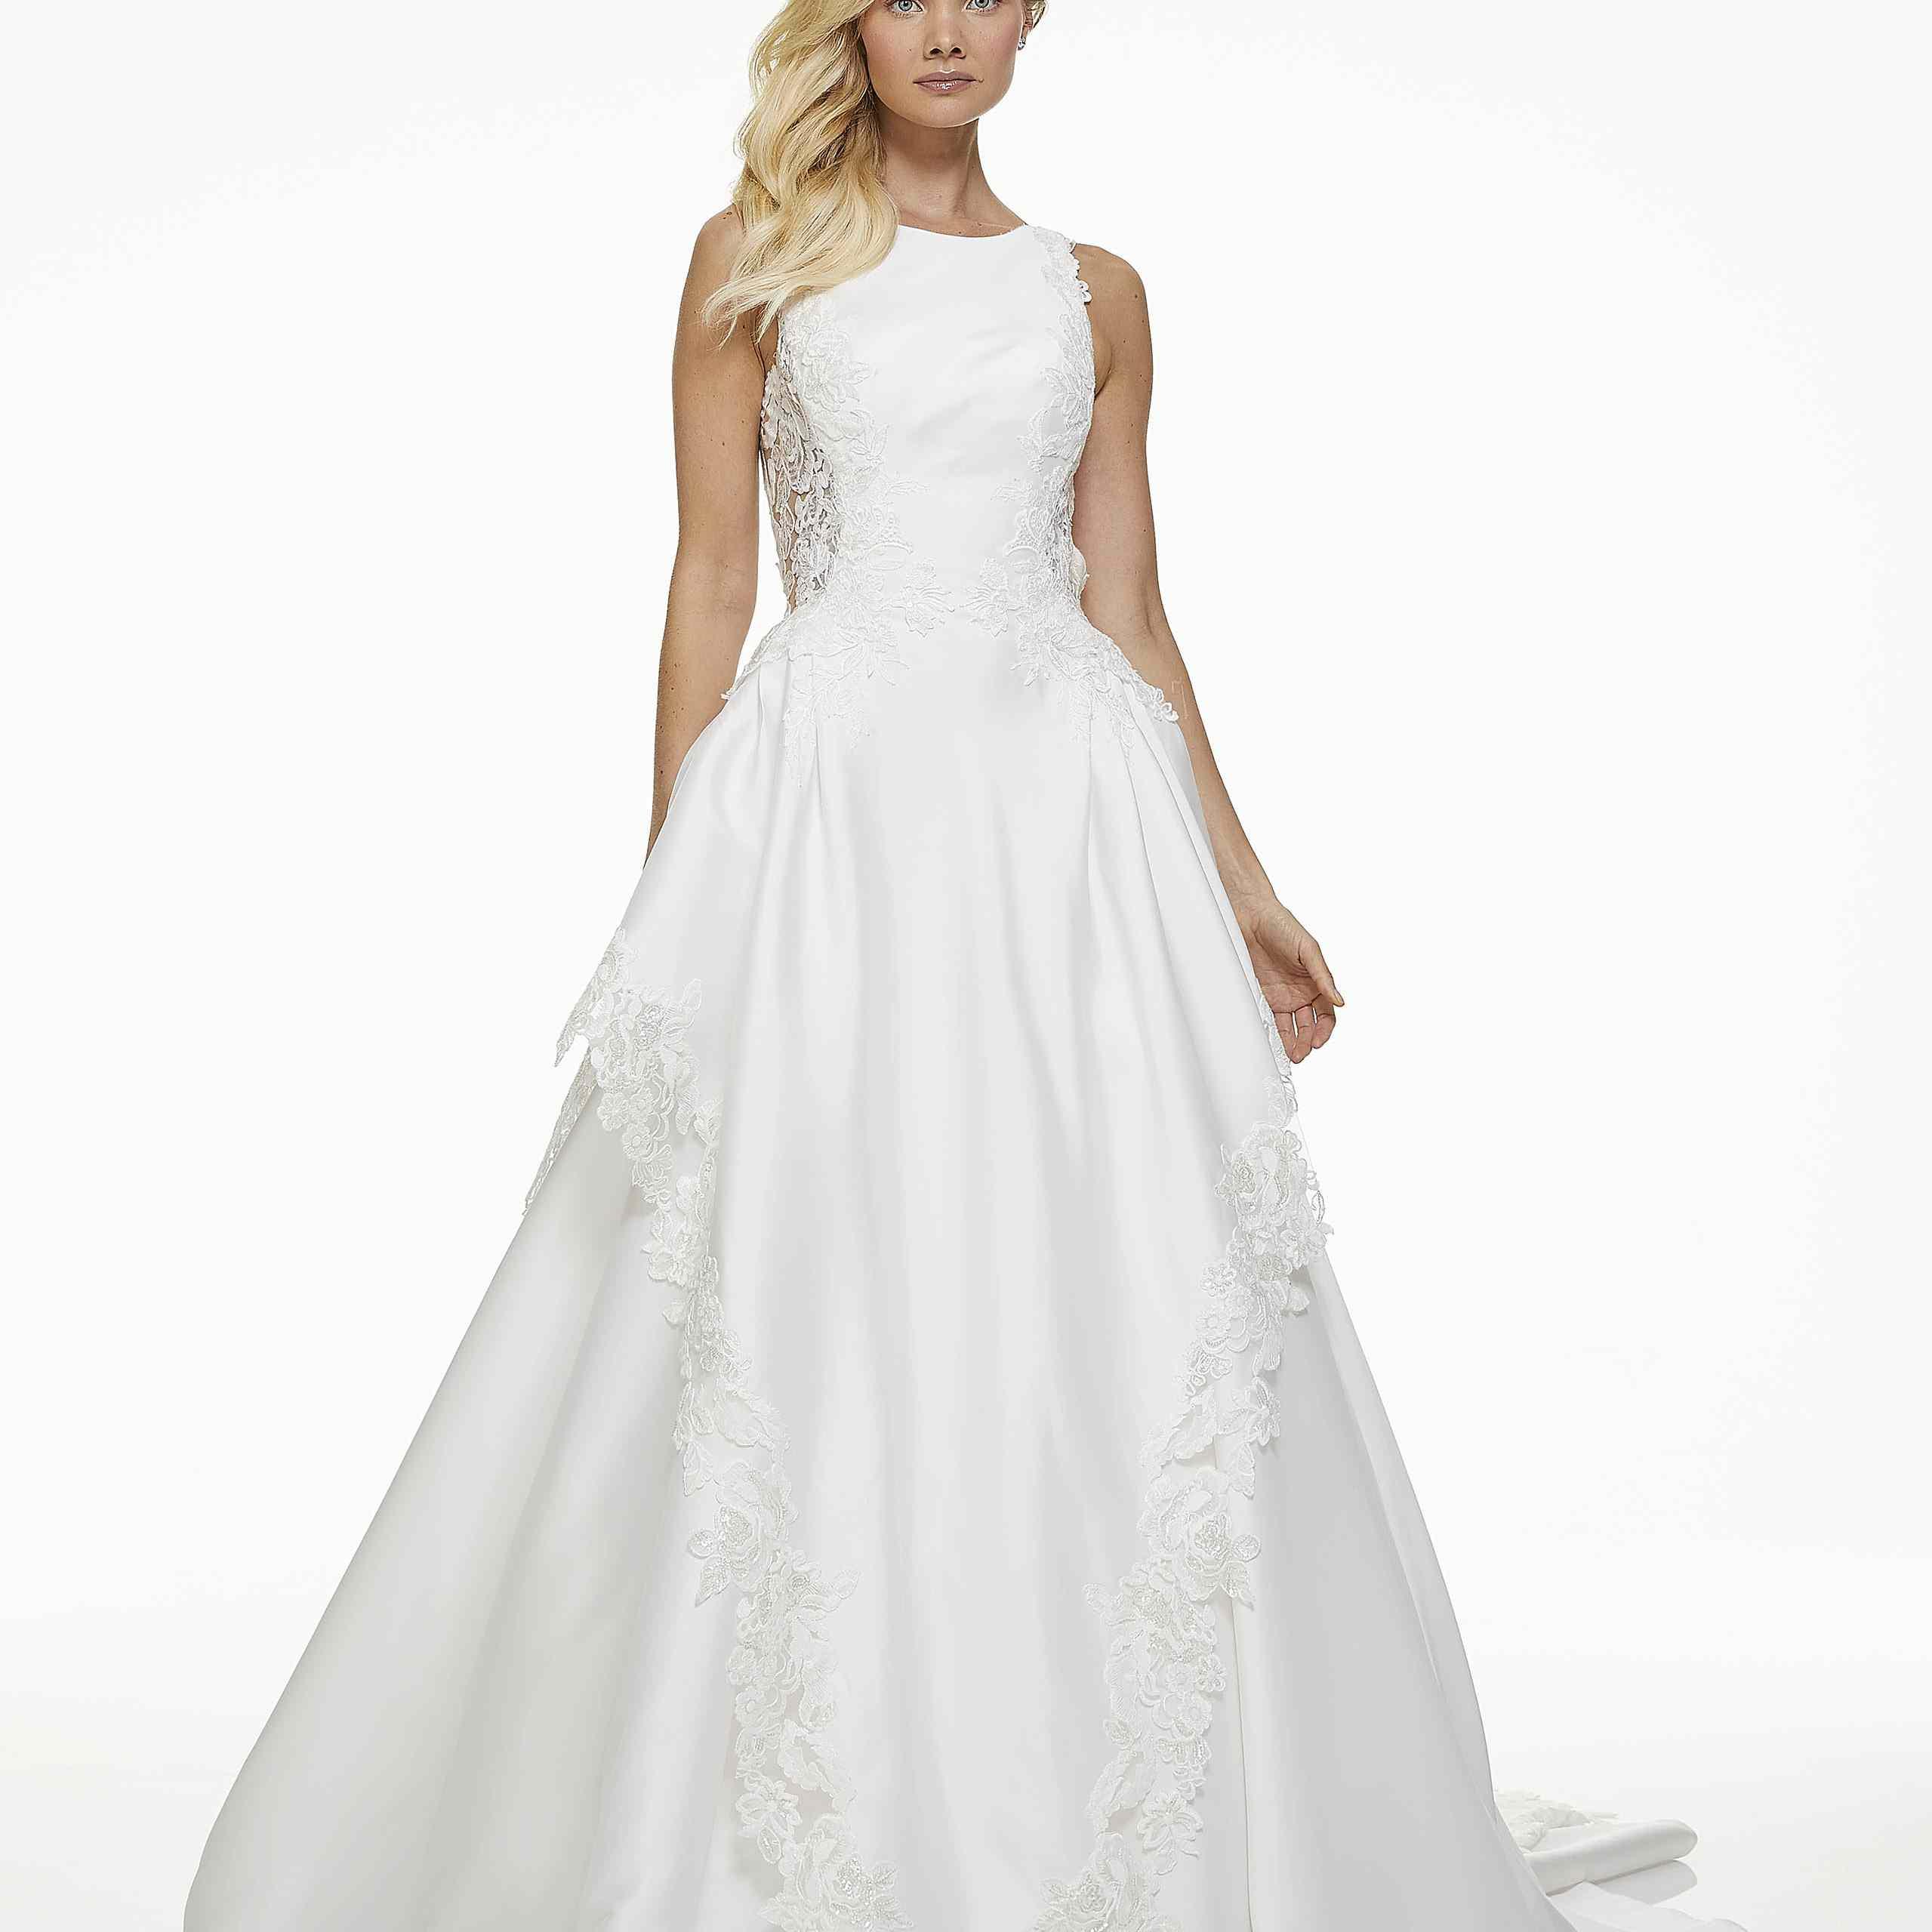 Model in sleeveless boat neck wedding ball gown